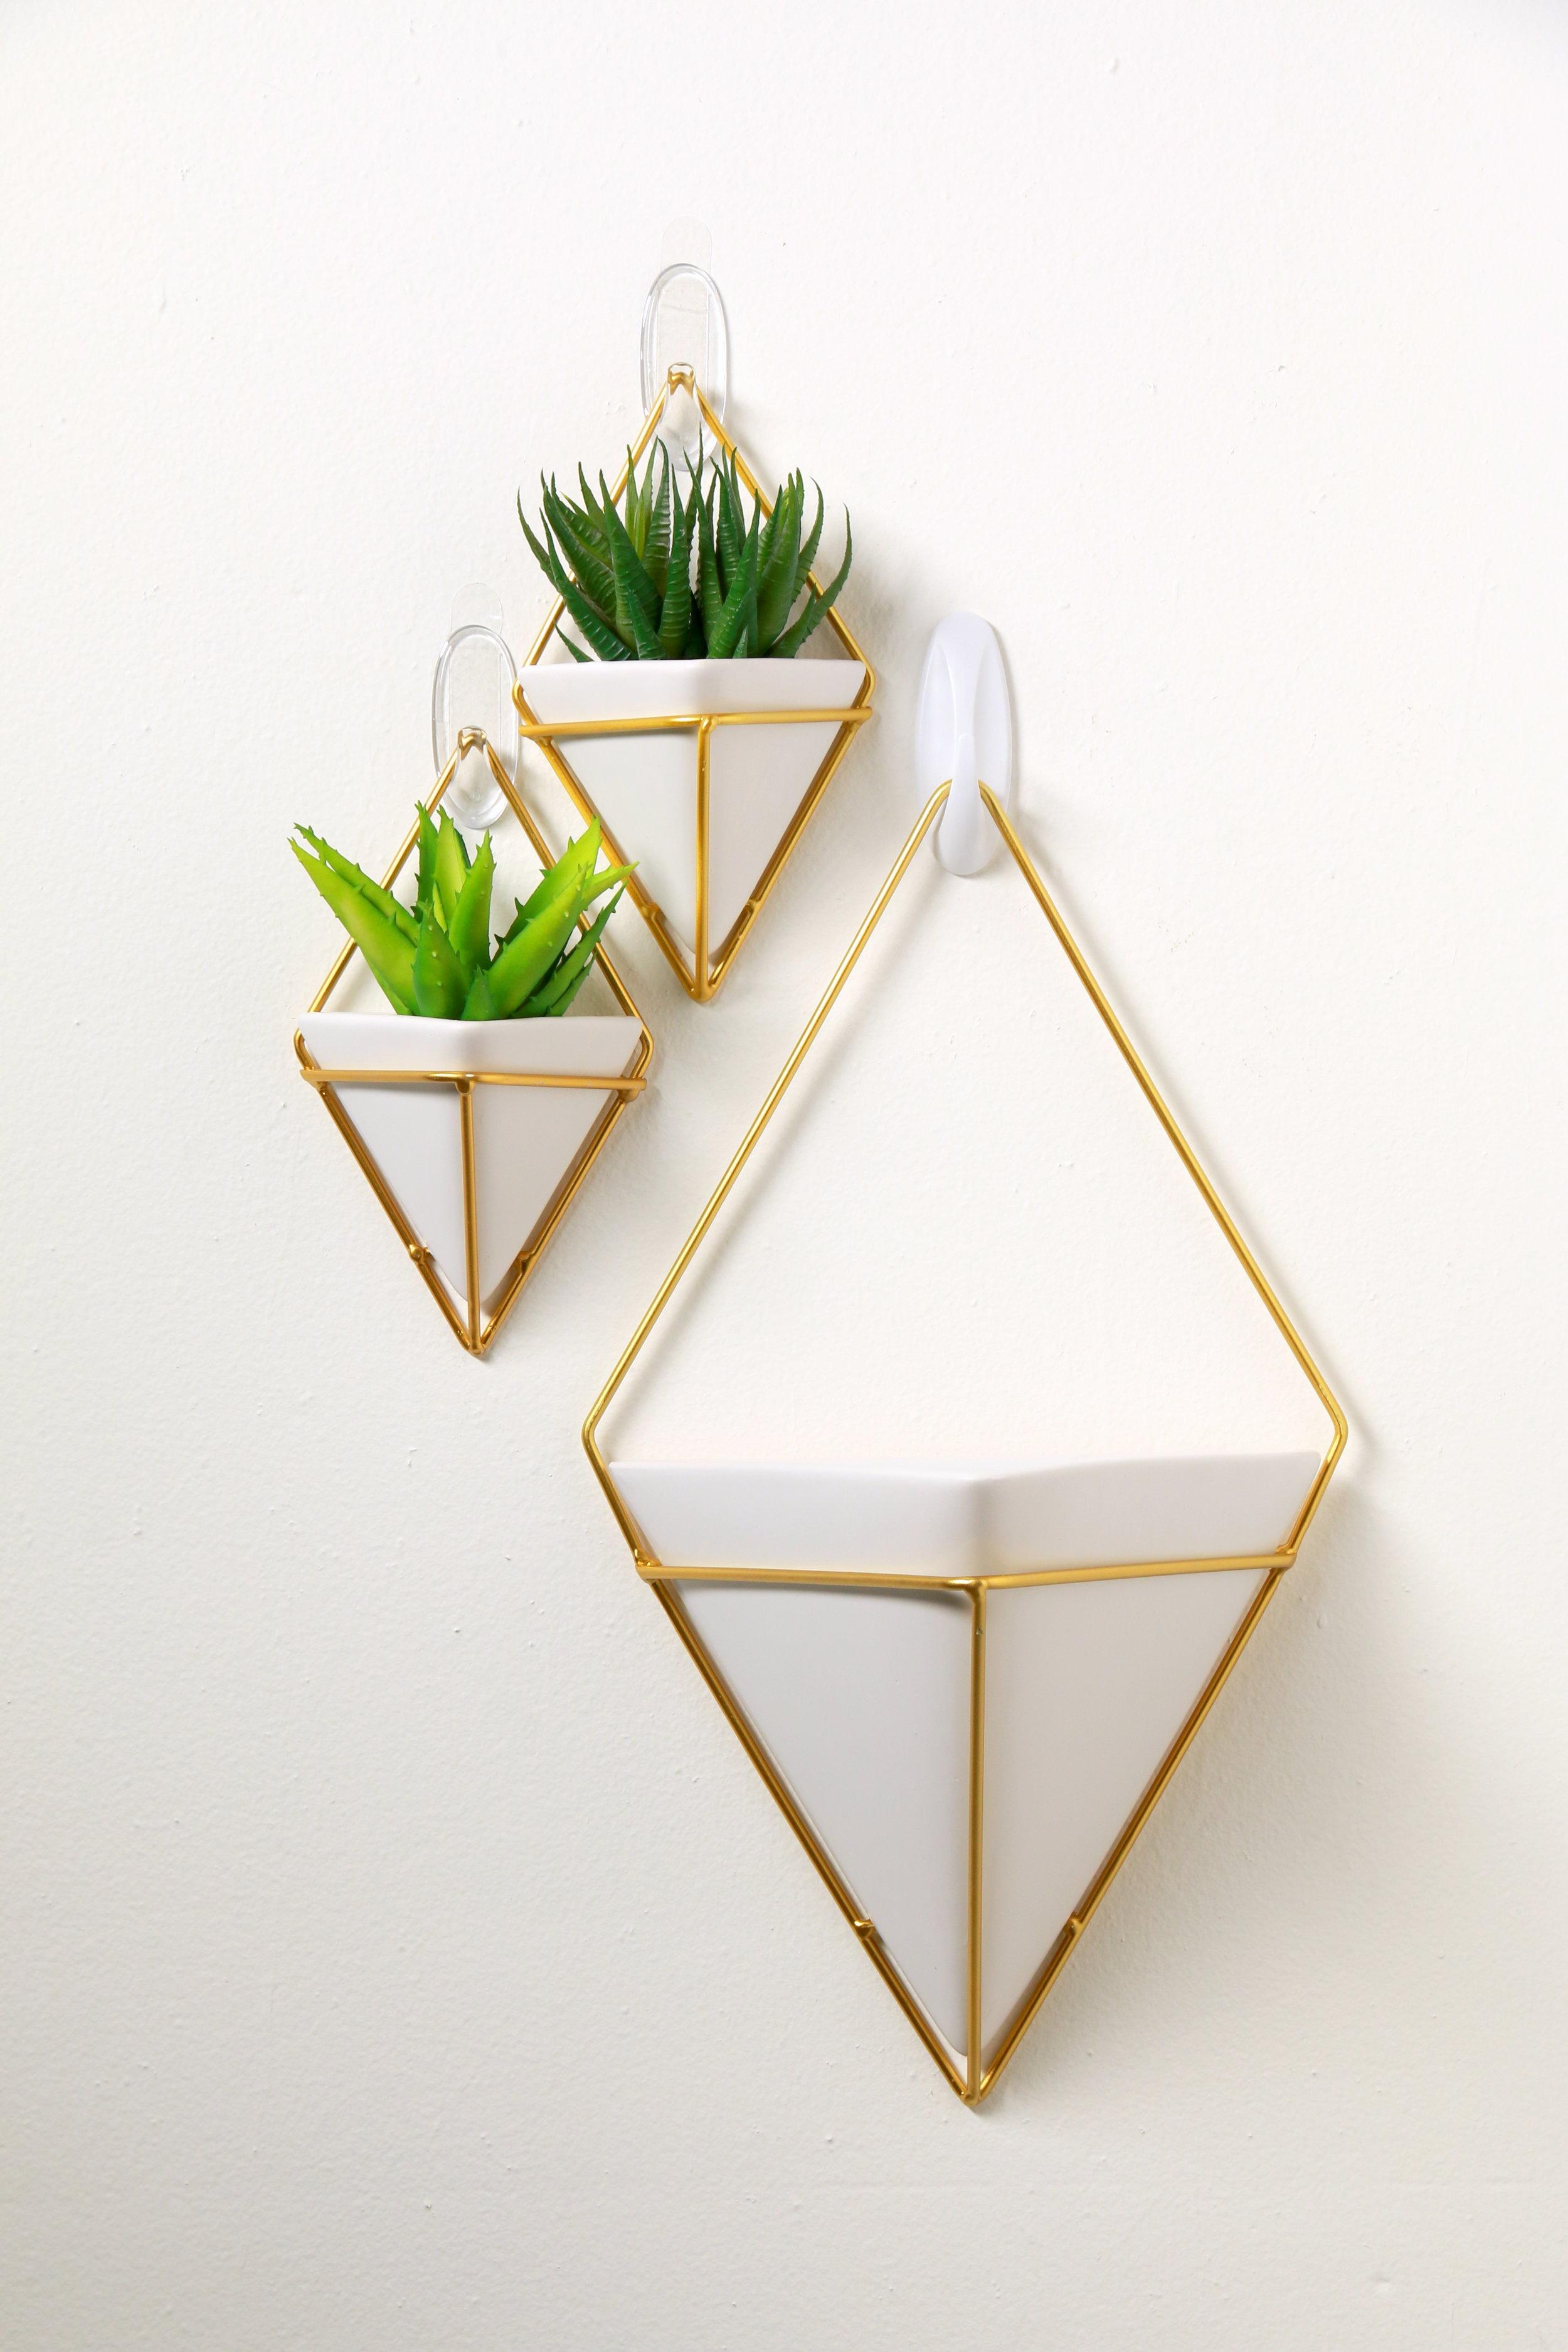 Decorative triangle shaped pot